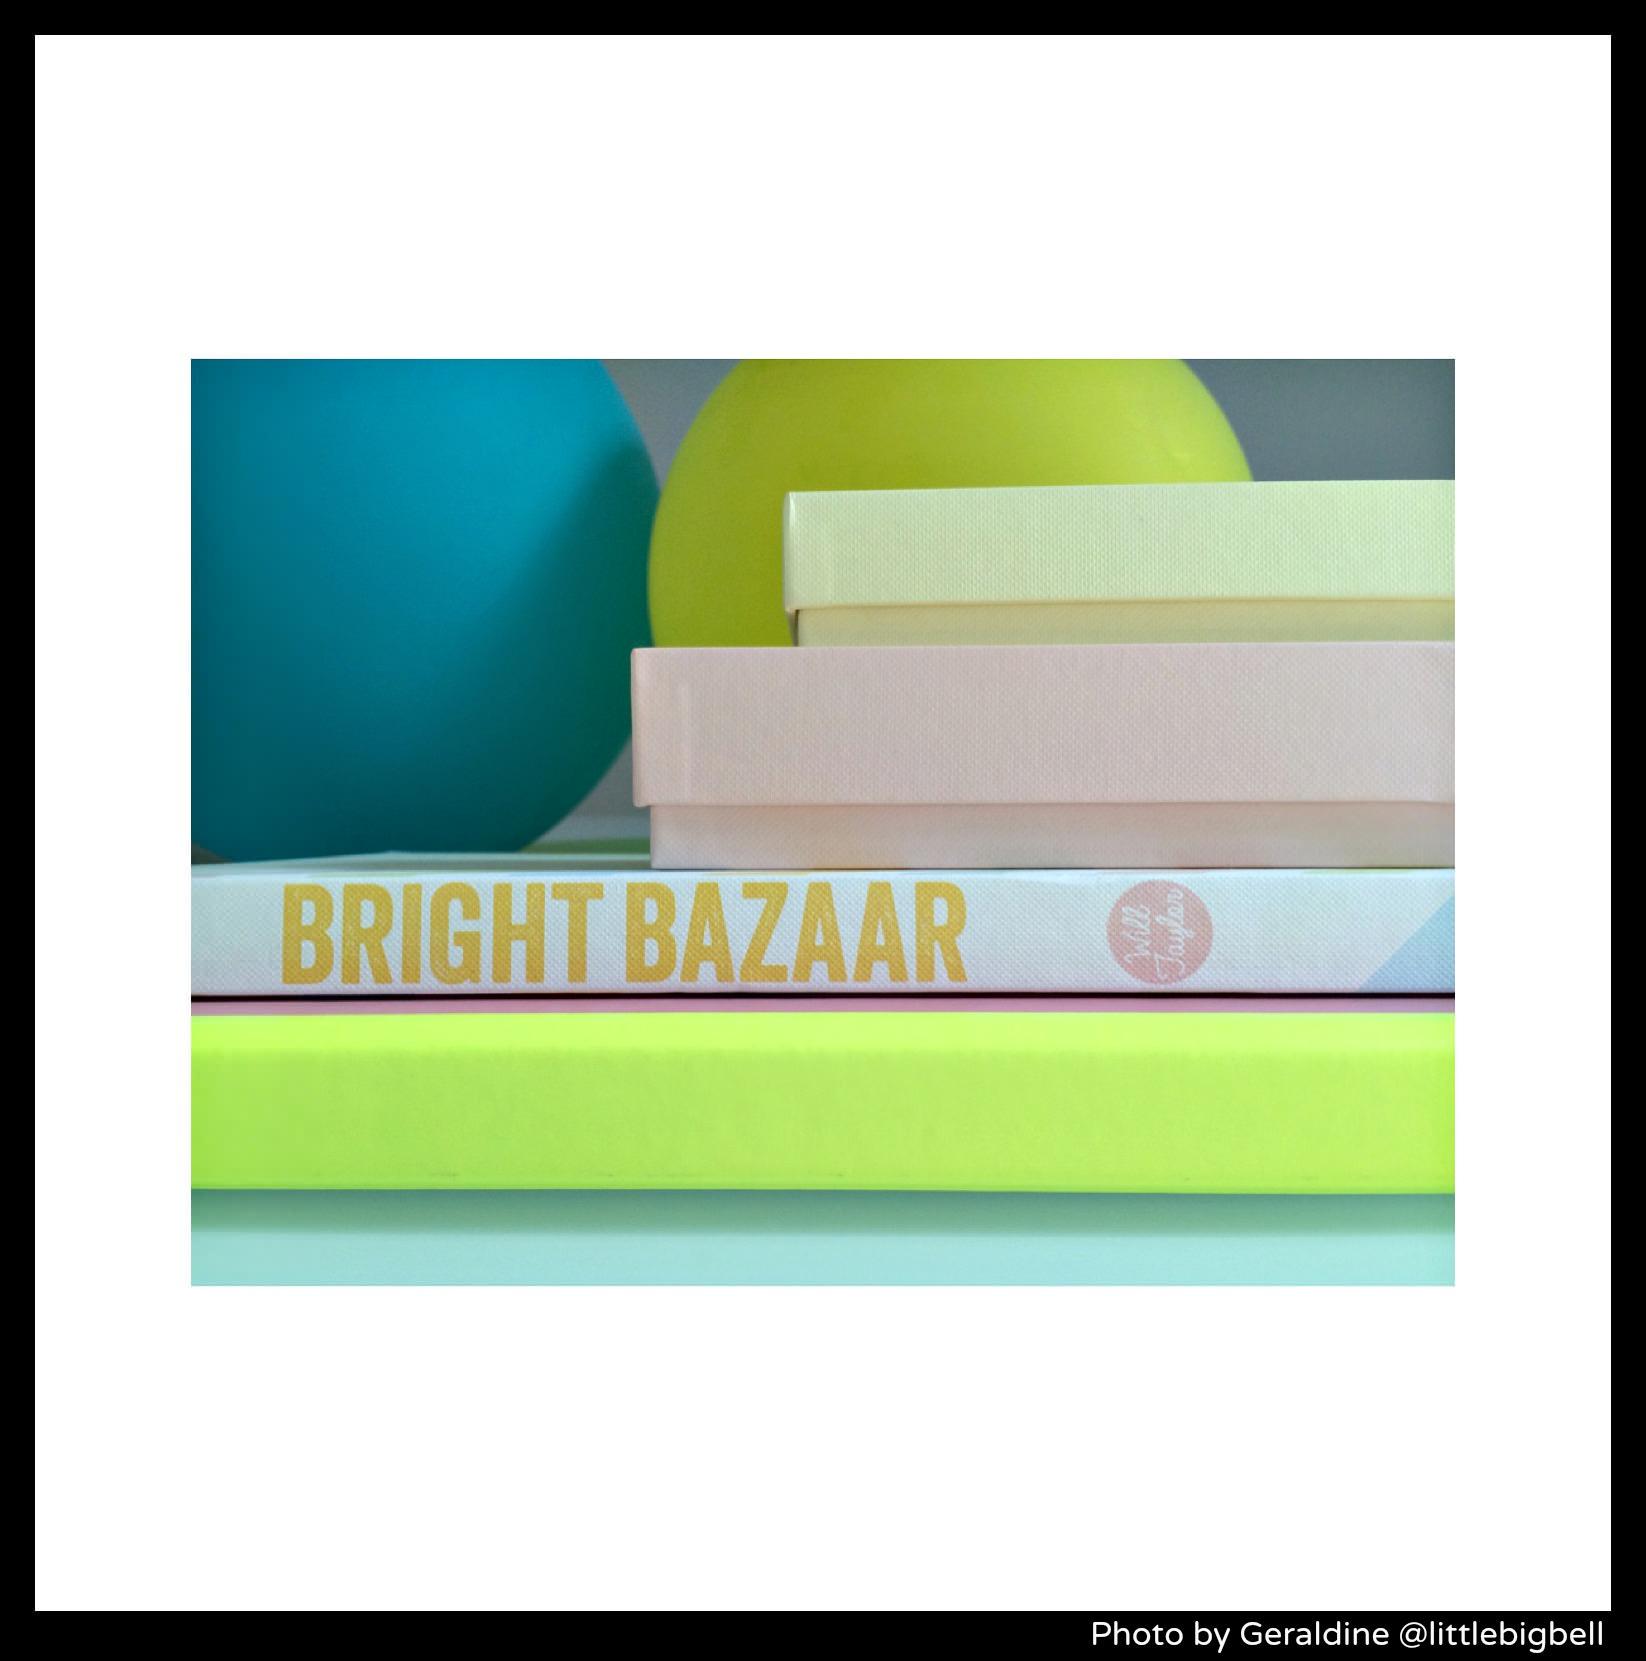 Bright-Bazaar-book-photo-by-Little-Big-Bell.jpg